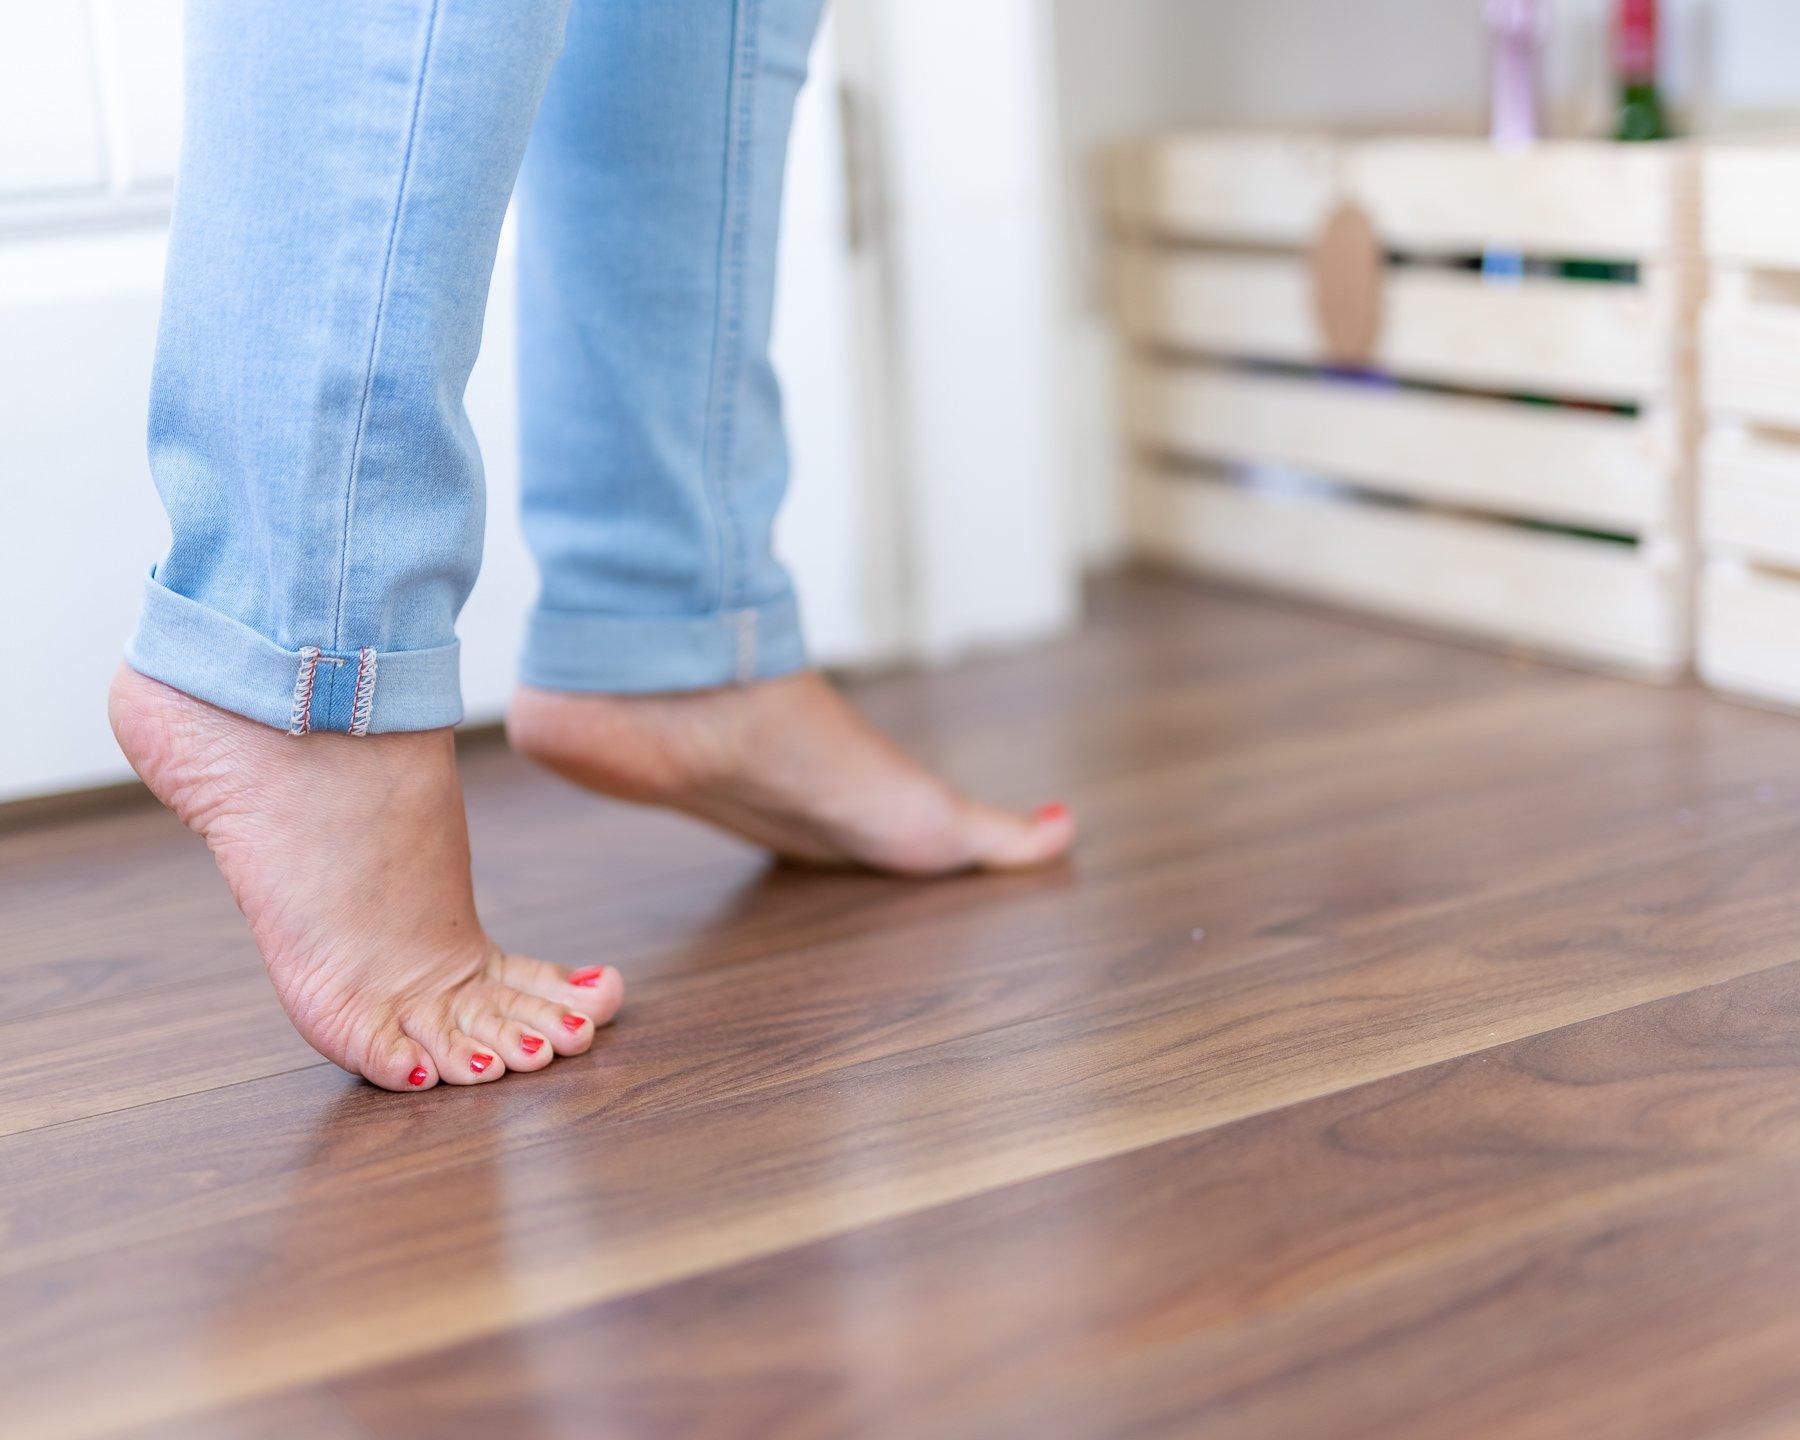 Brand portrait of feet